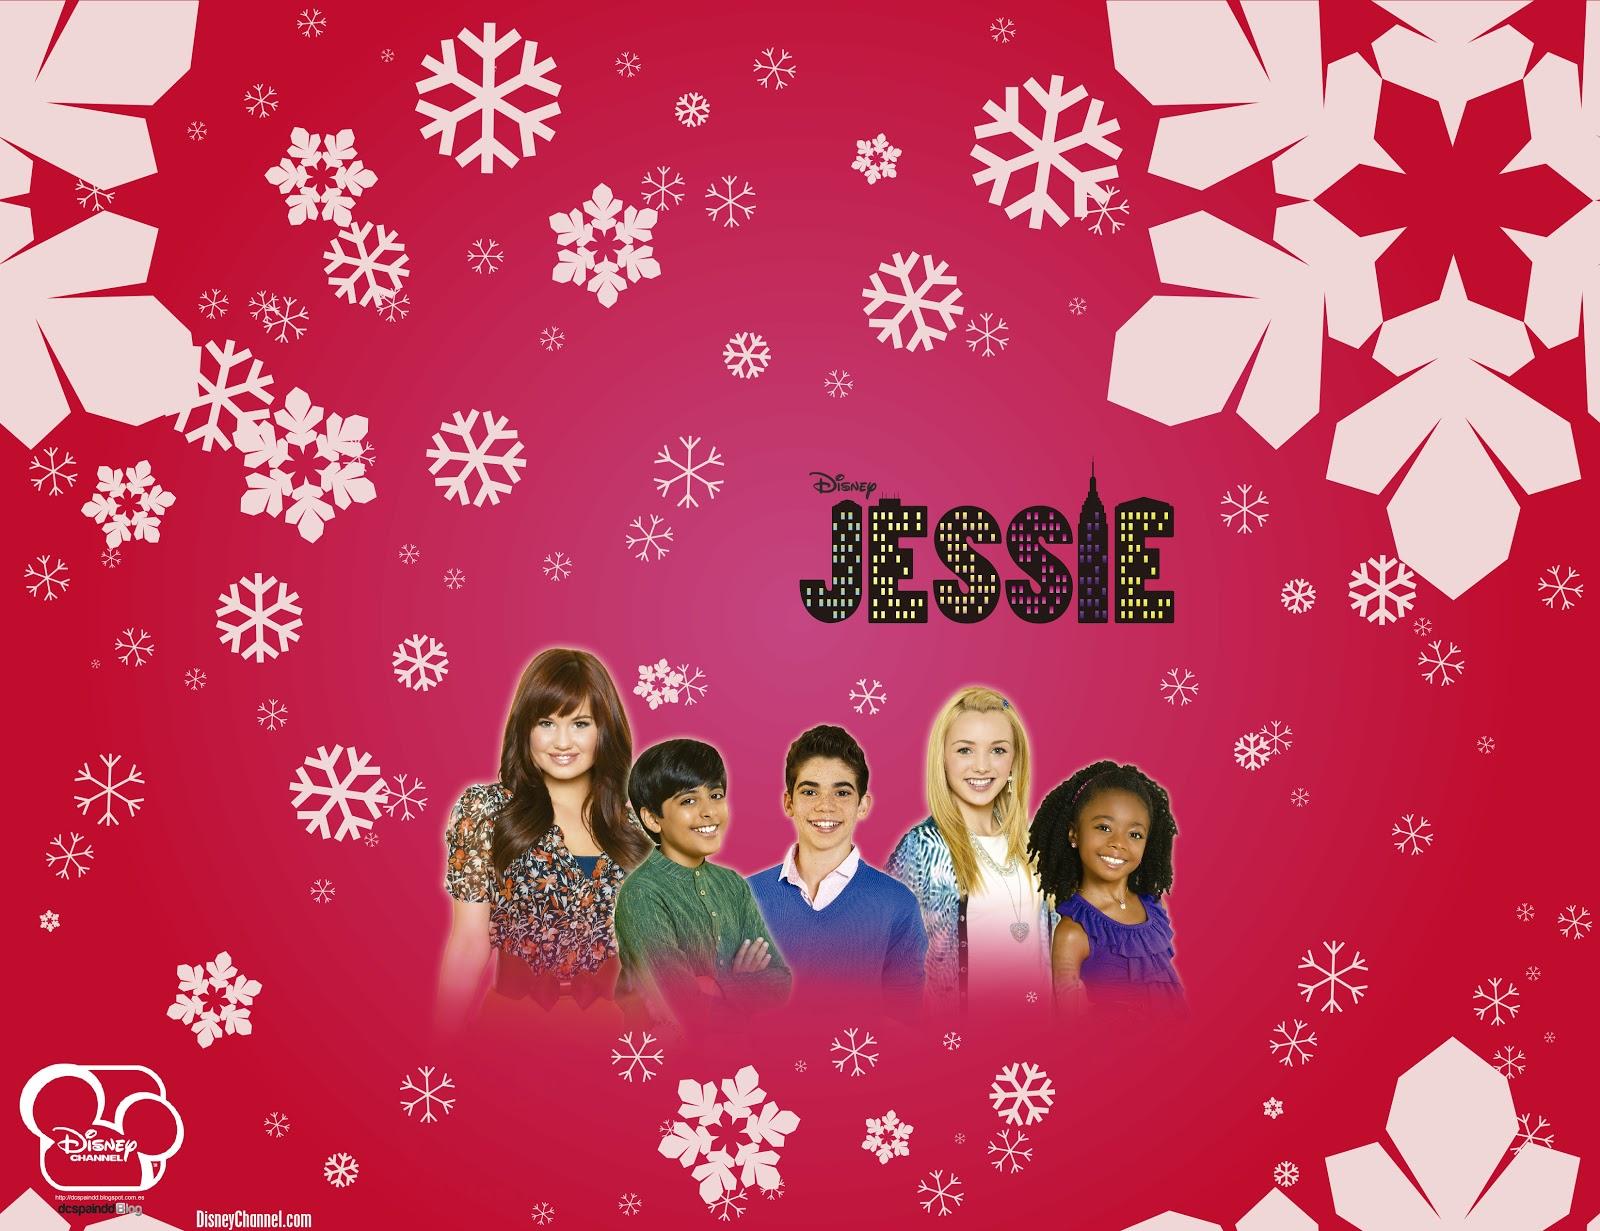 DCSPAINDD BLOG DISNEY CHANNEL Jessie wallpaper exclusivo oficial 1600x1231